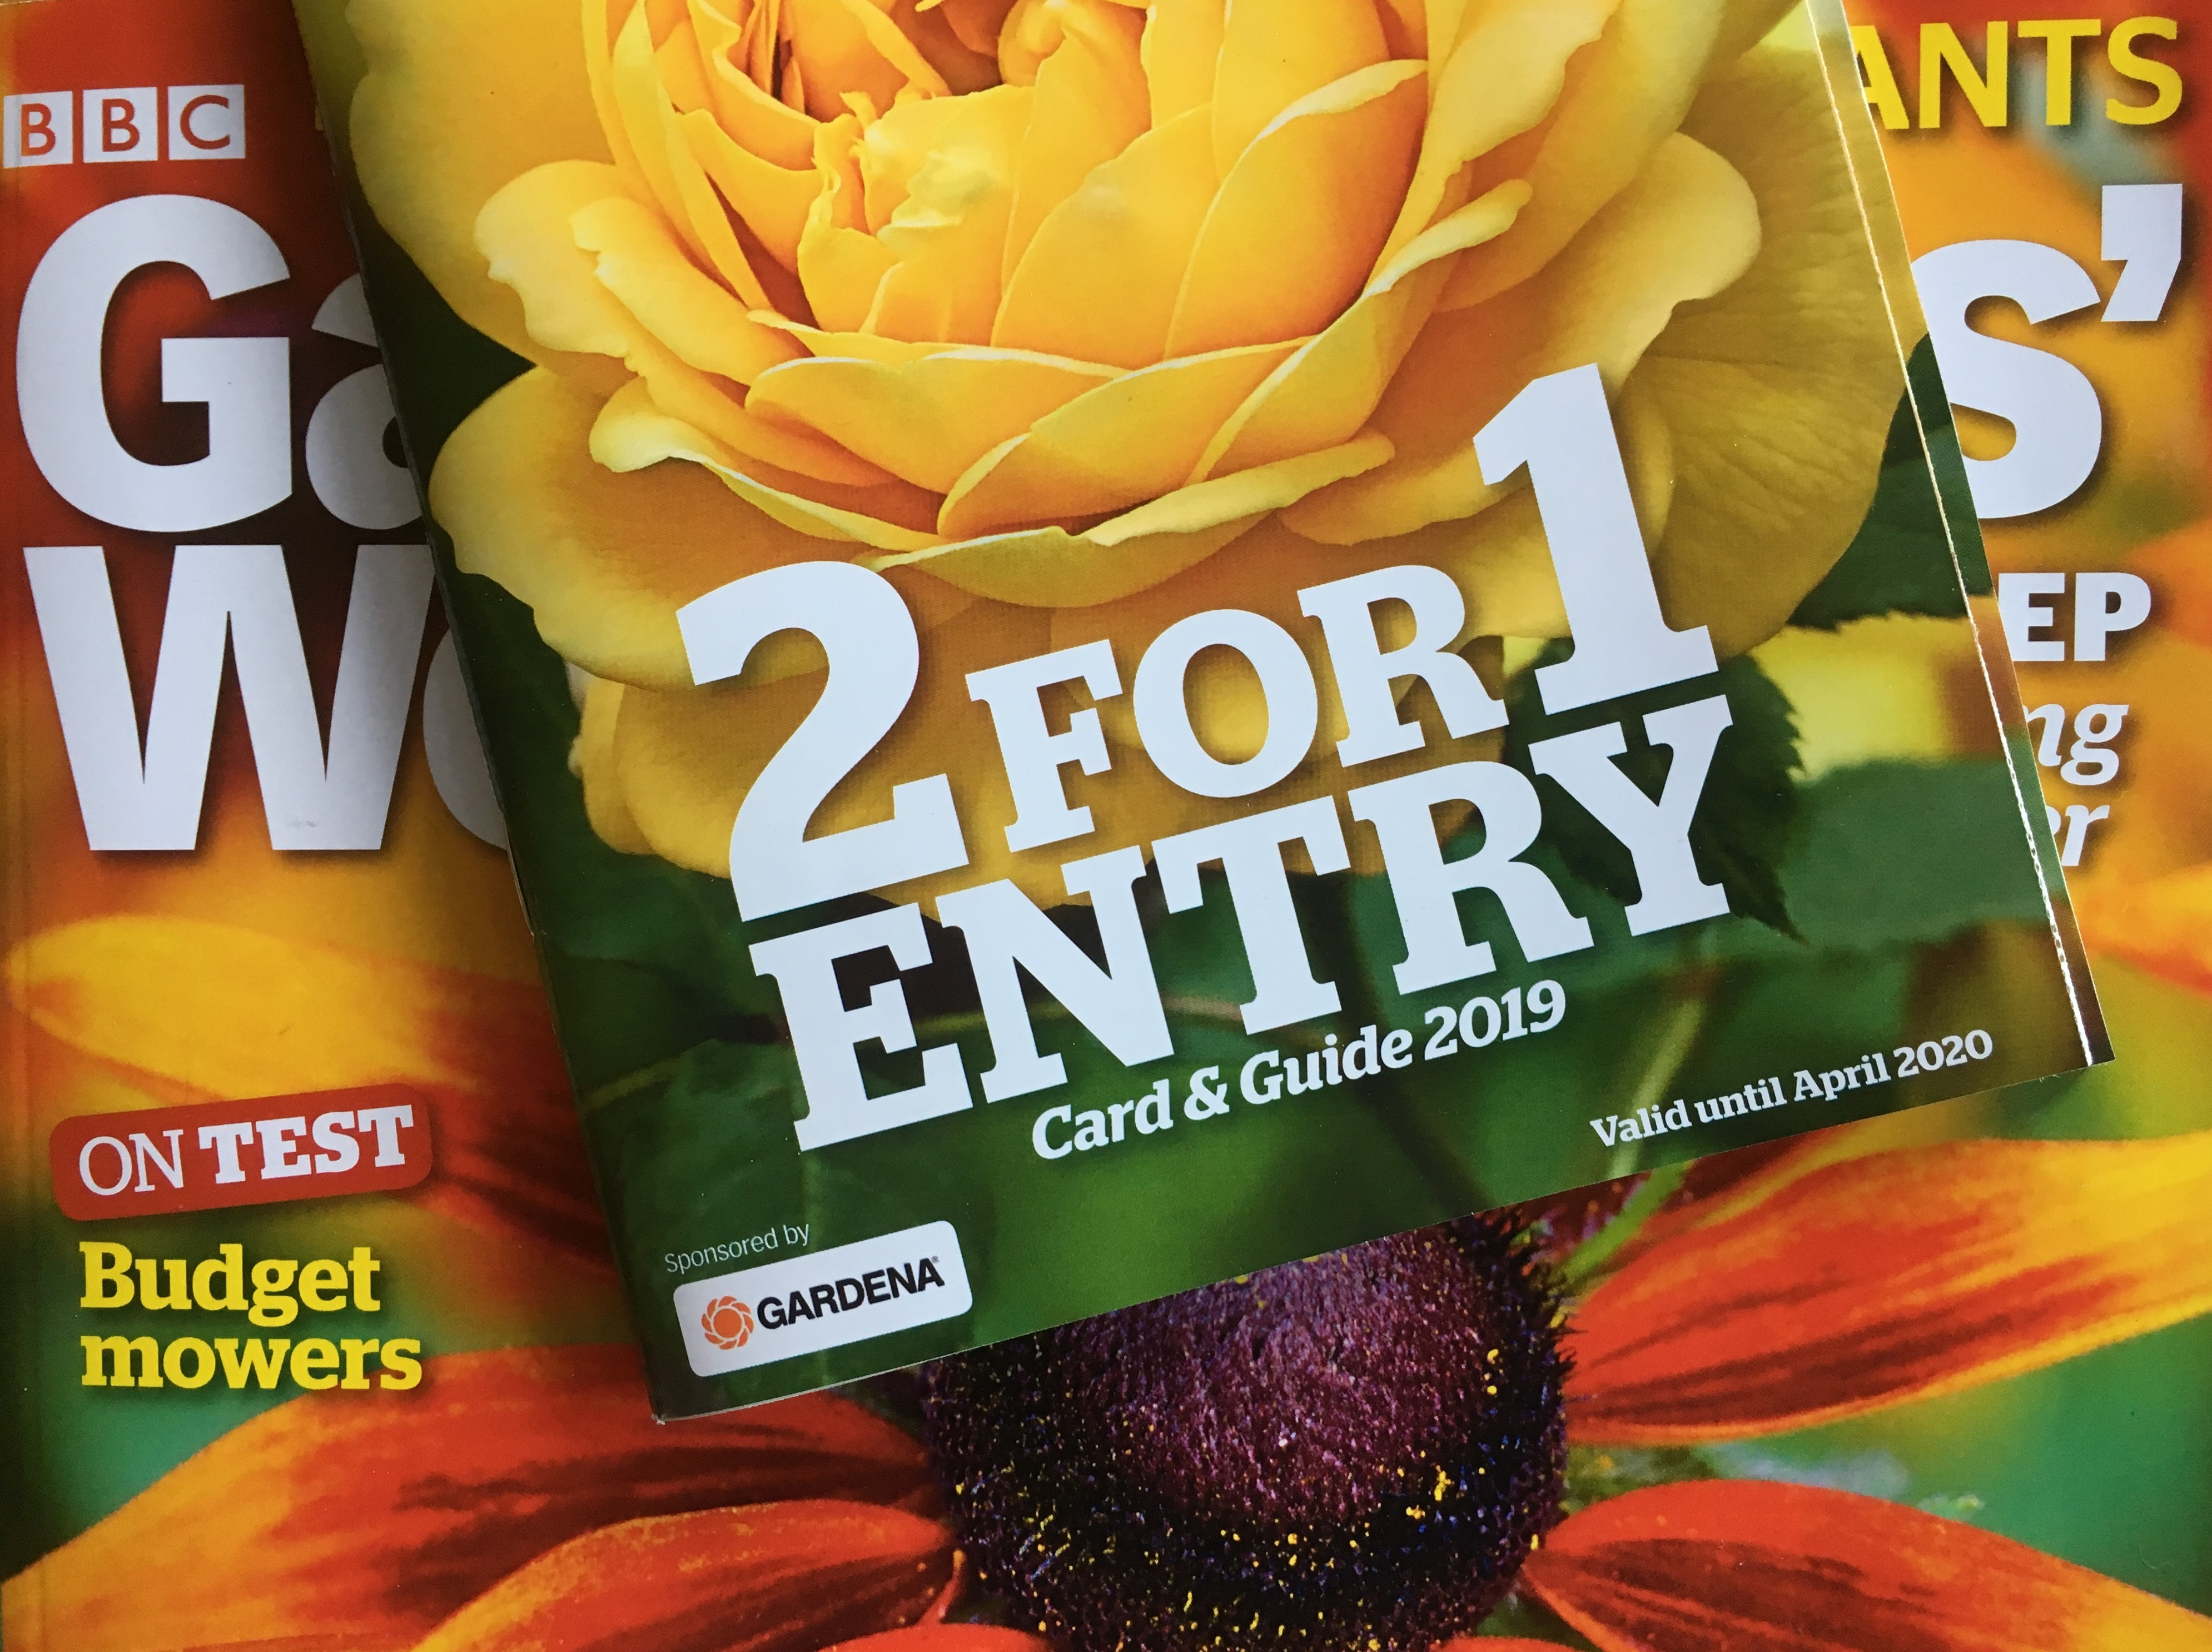 Gardeners' World - 2 for 1 Entry - April 2019